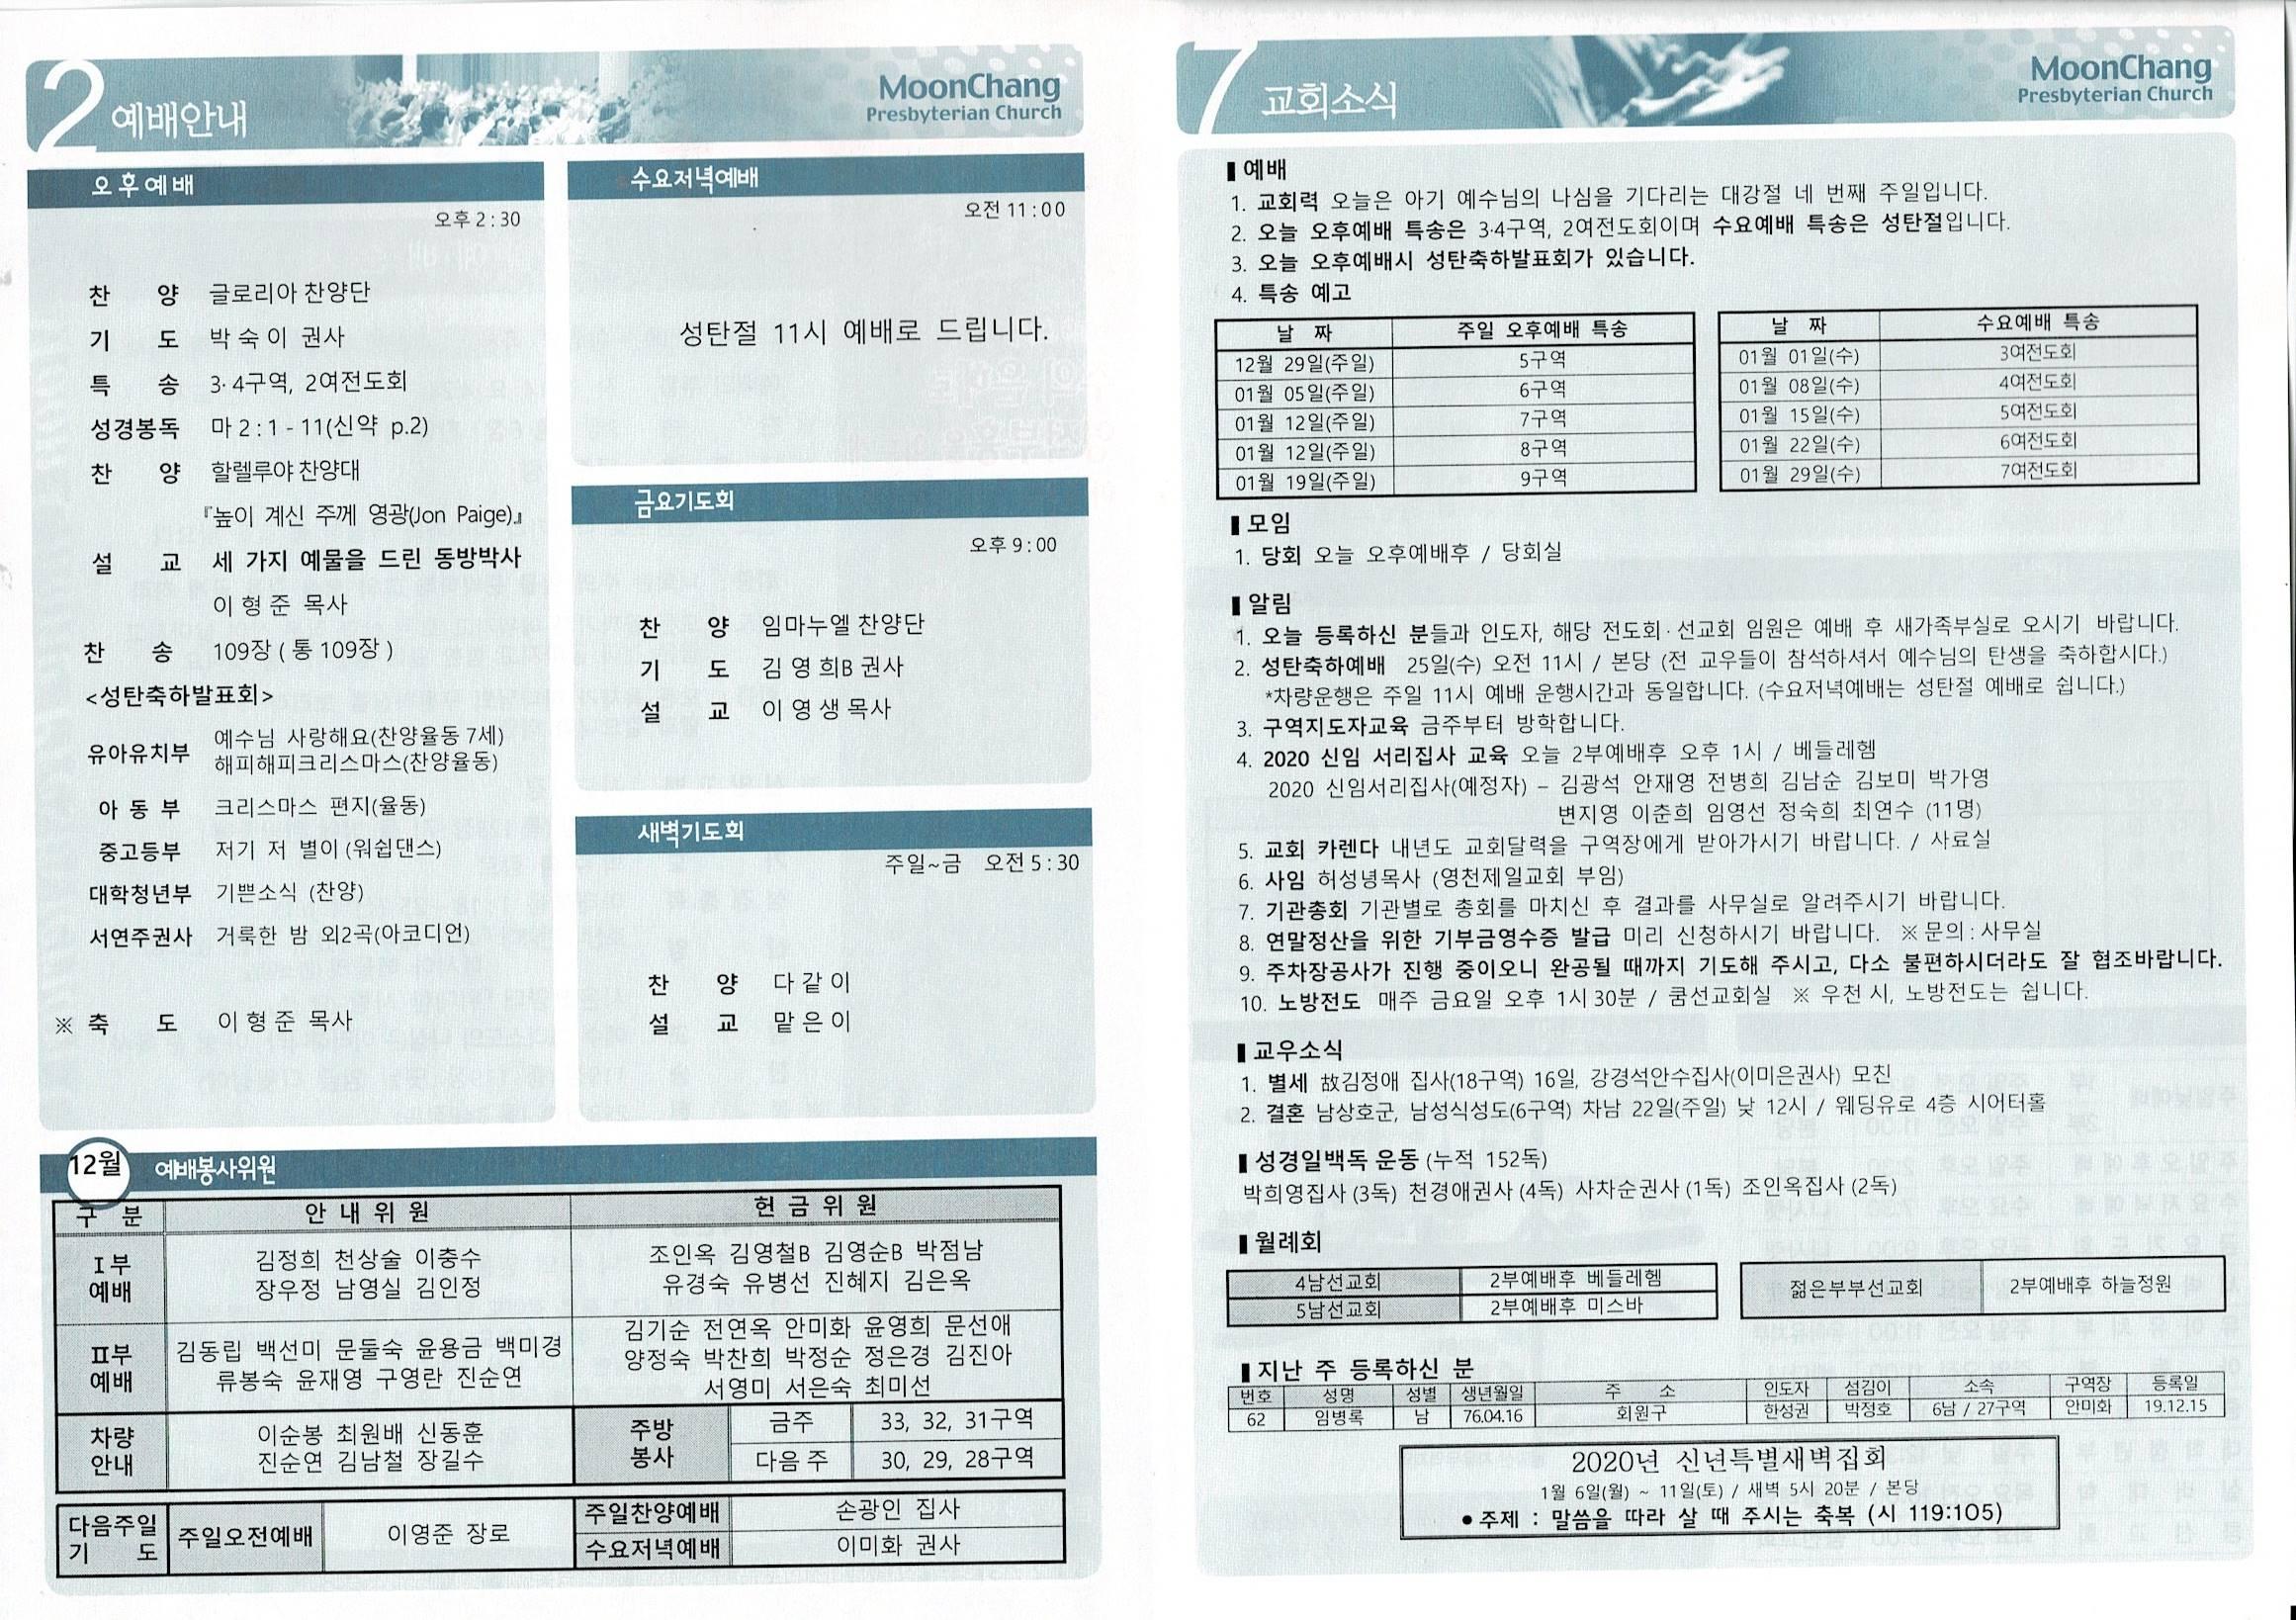 Scan2019-12-21_141923_001.jpg